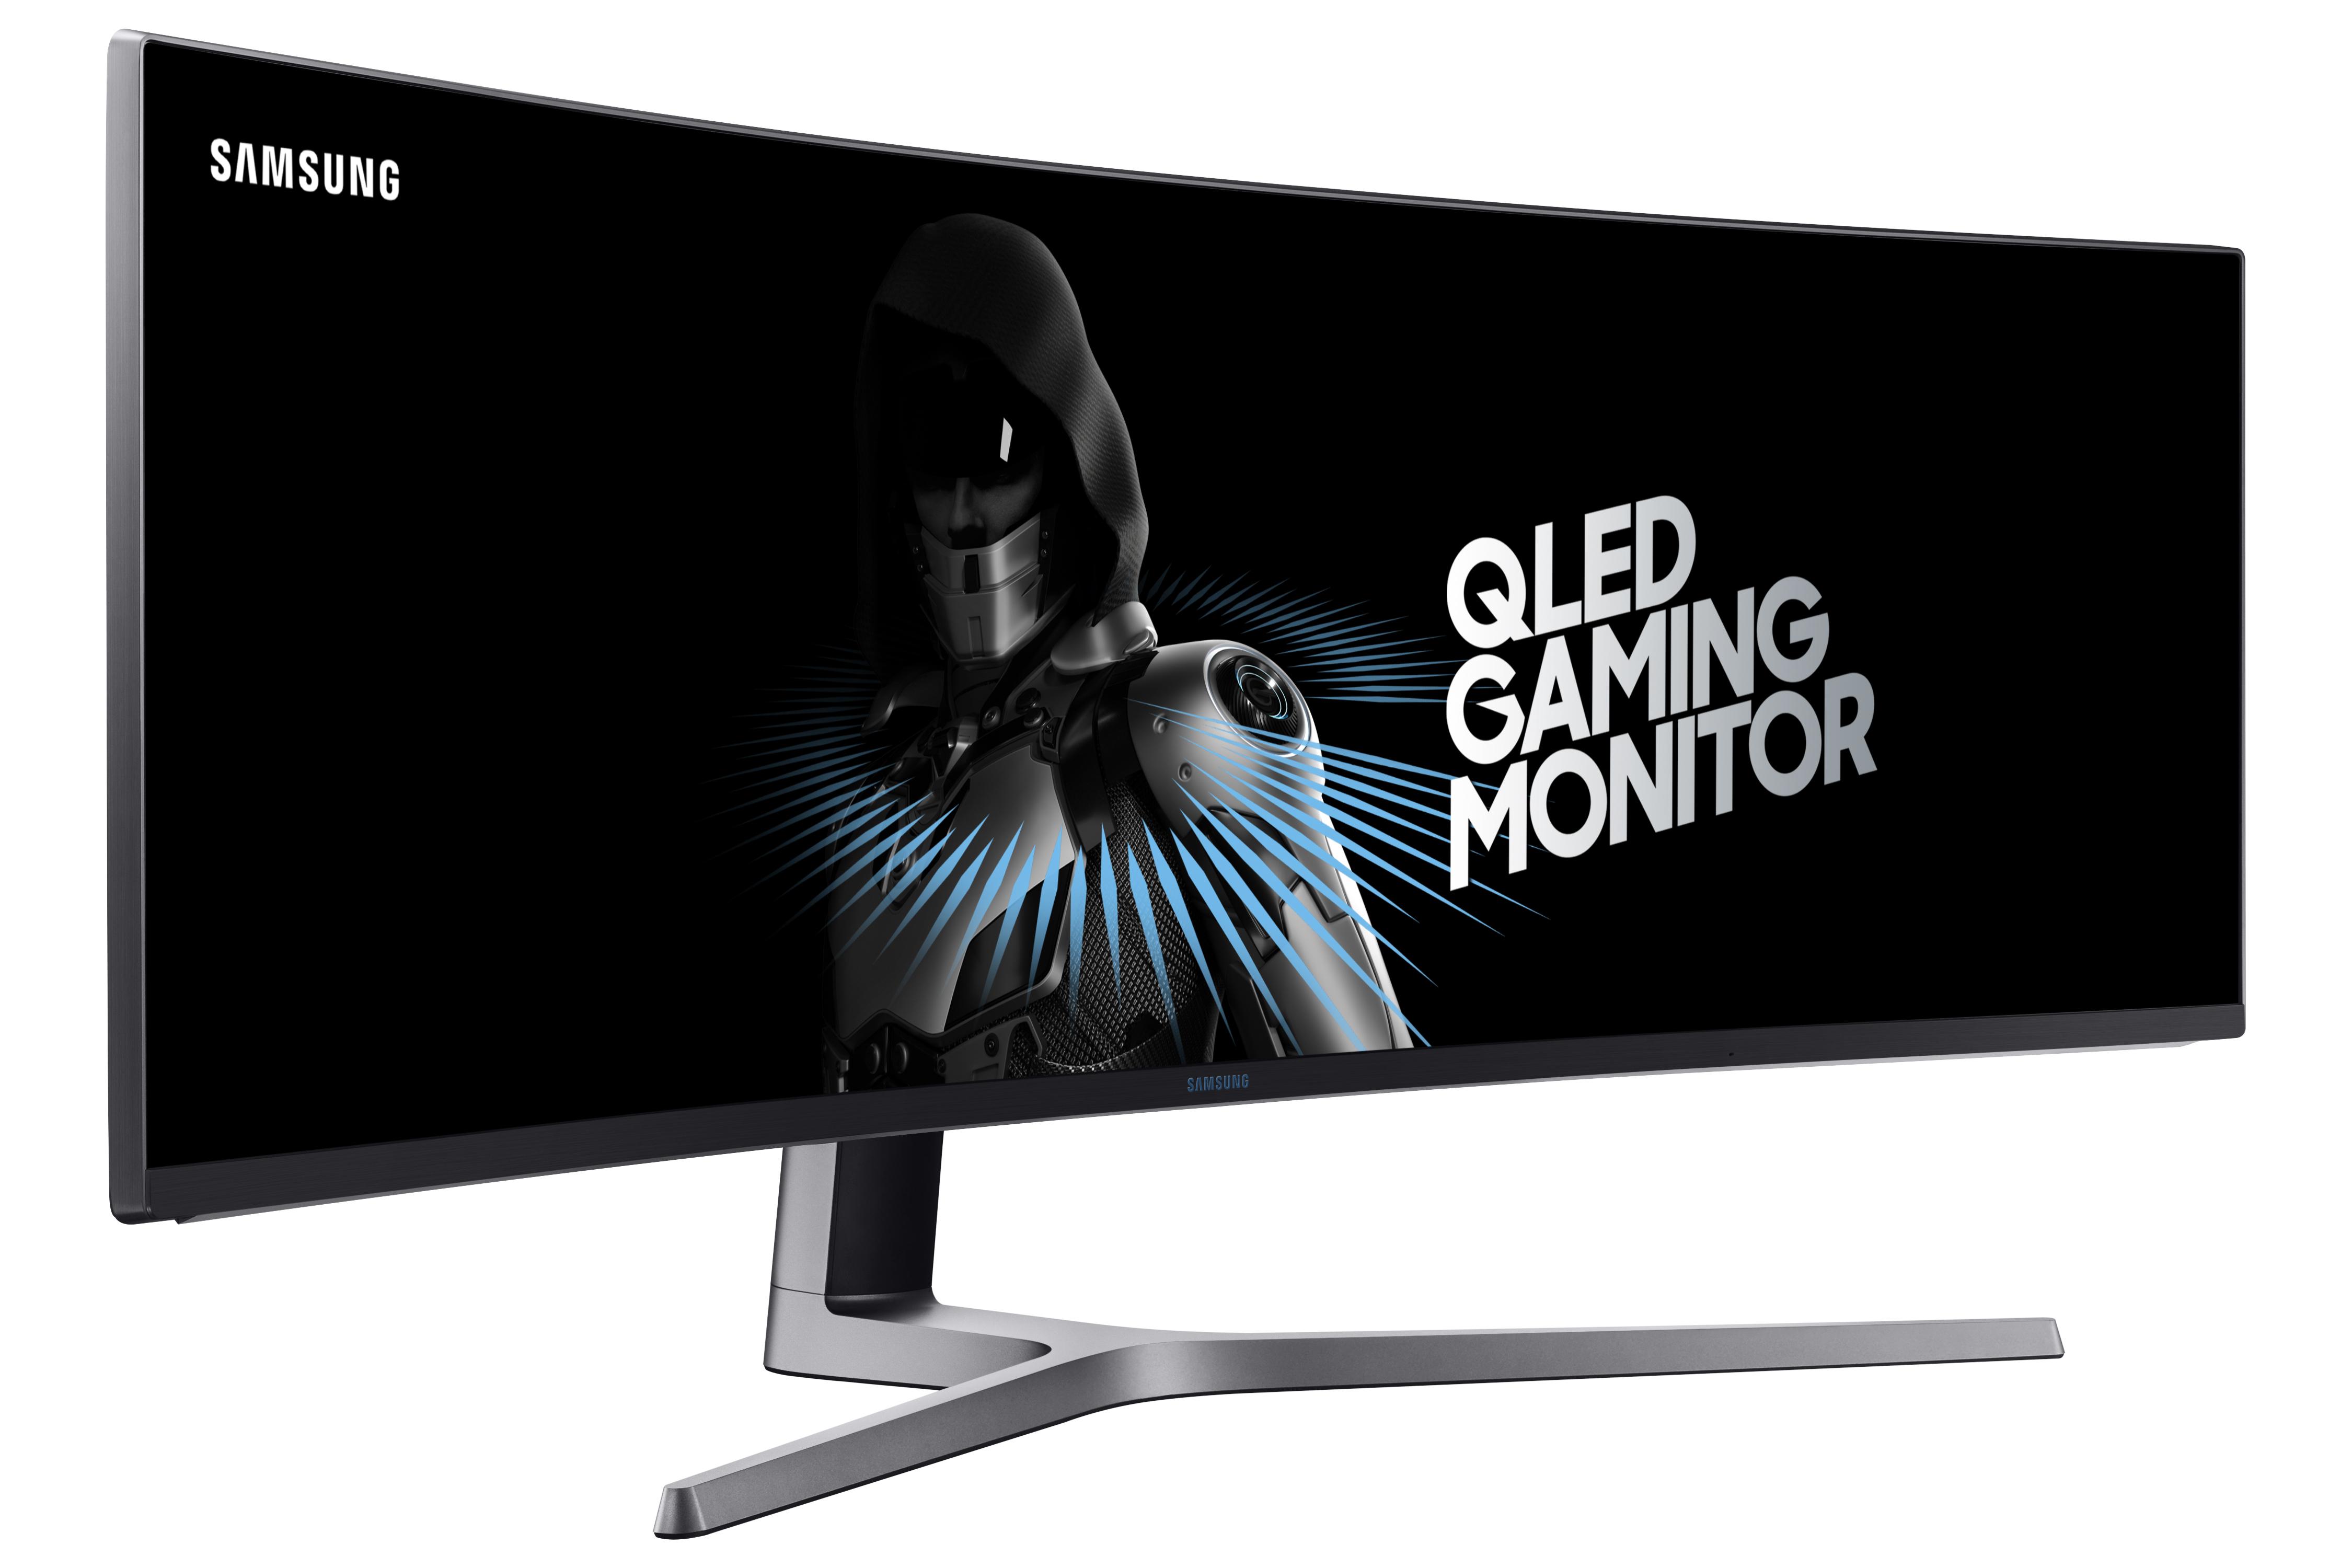 Samsung Unveils HDR Enabled QLED Gaming Monitors - Samsung US Newsroom